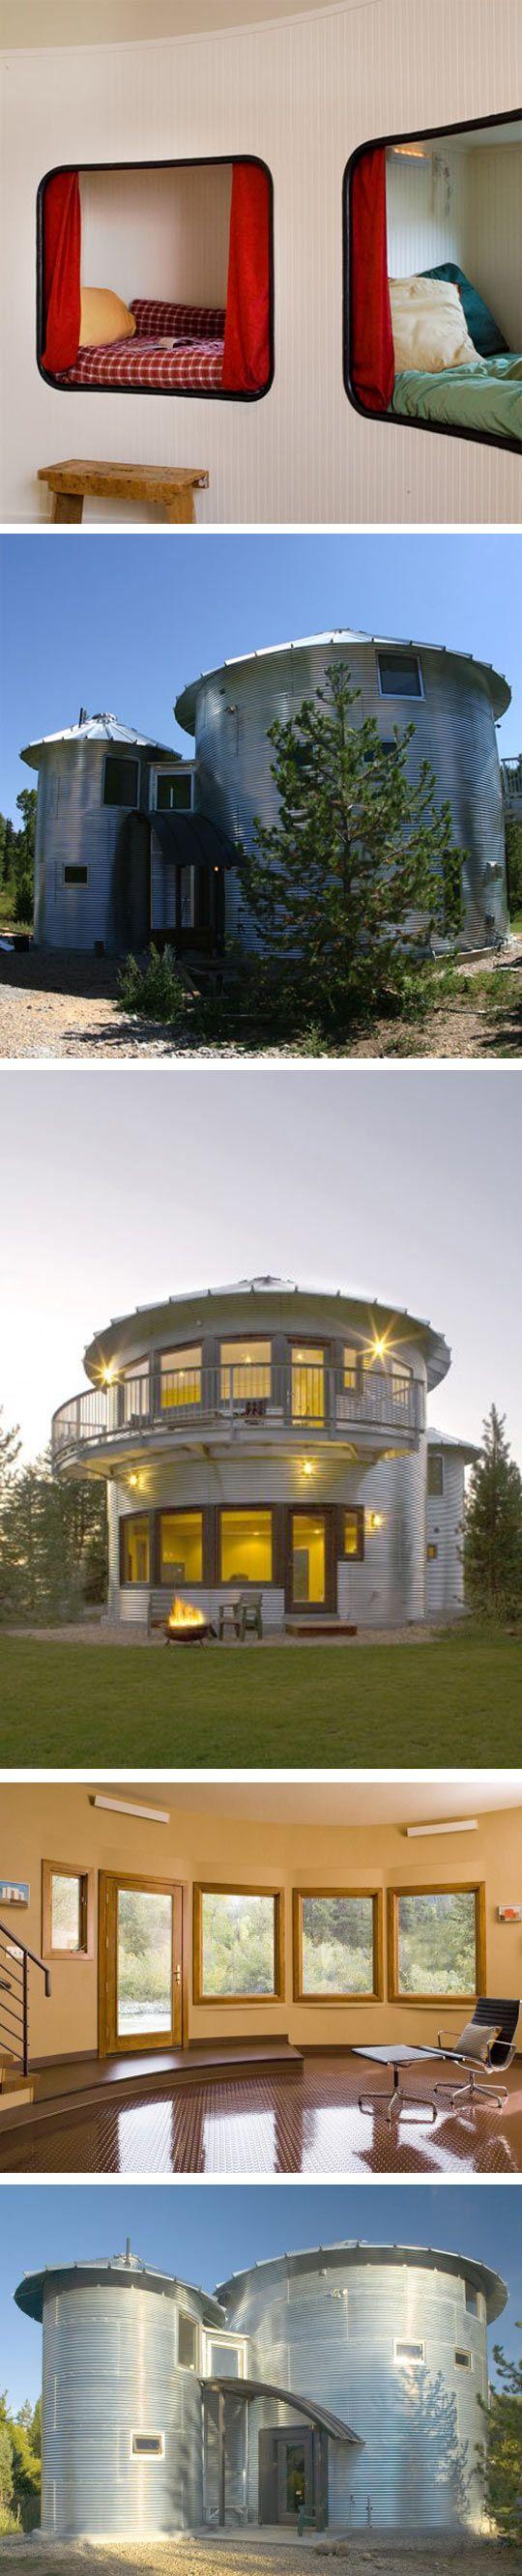 Grain Bin Home Best 20 Silo House Ideas On Pinterest Grain Silo Country Bar